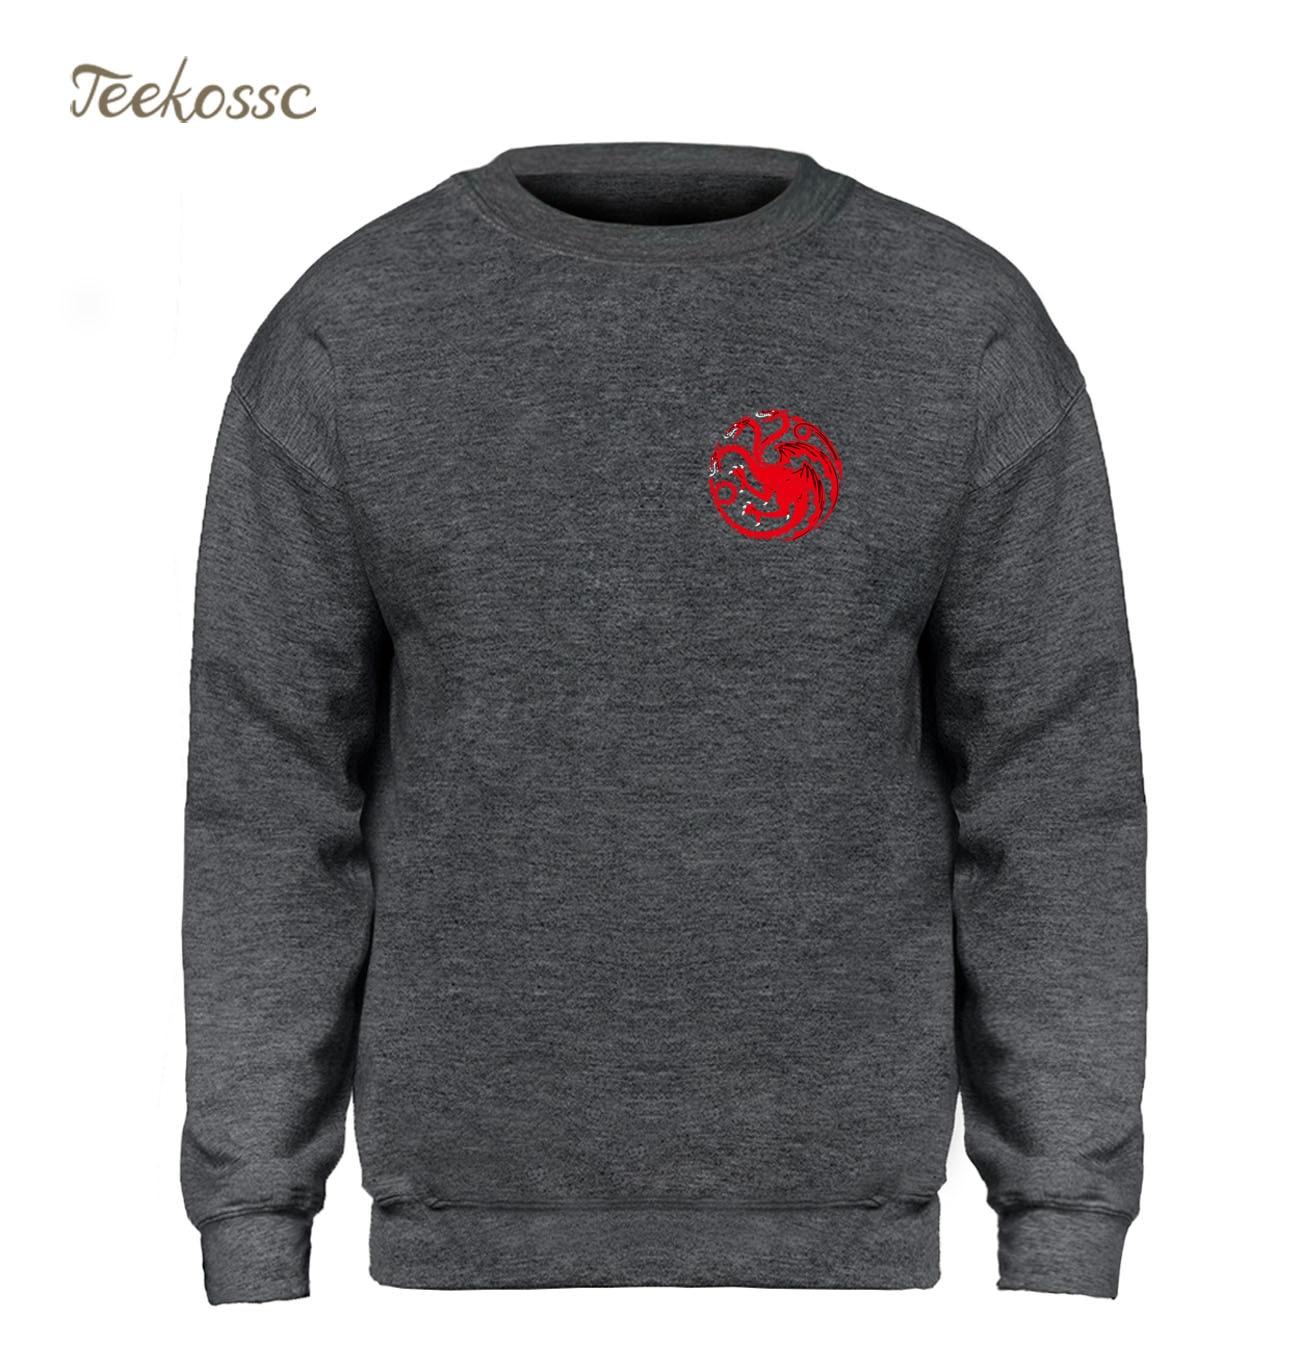 Game Of Thrones Hoodie Men Targaryen Fire & Blood Sweatshirt Hip Hop Sweatshirts 2018 Winter Autumn Fleece Warm Cool Sportswear